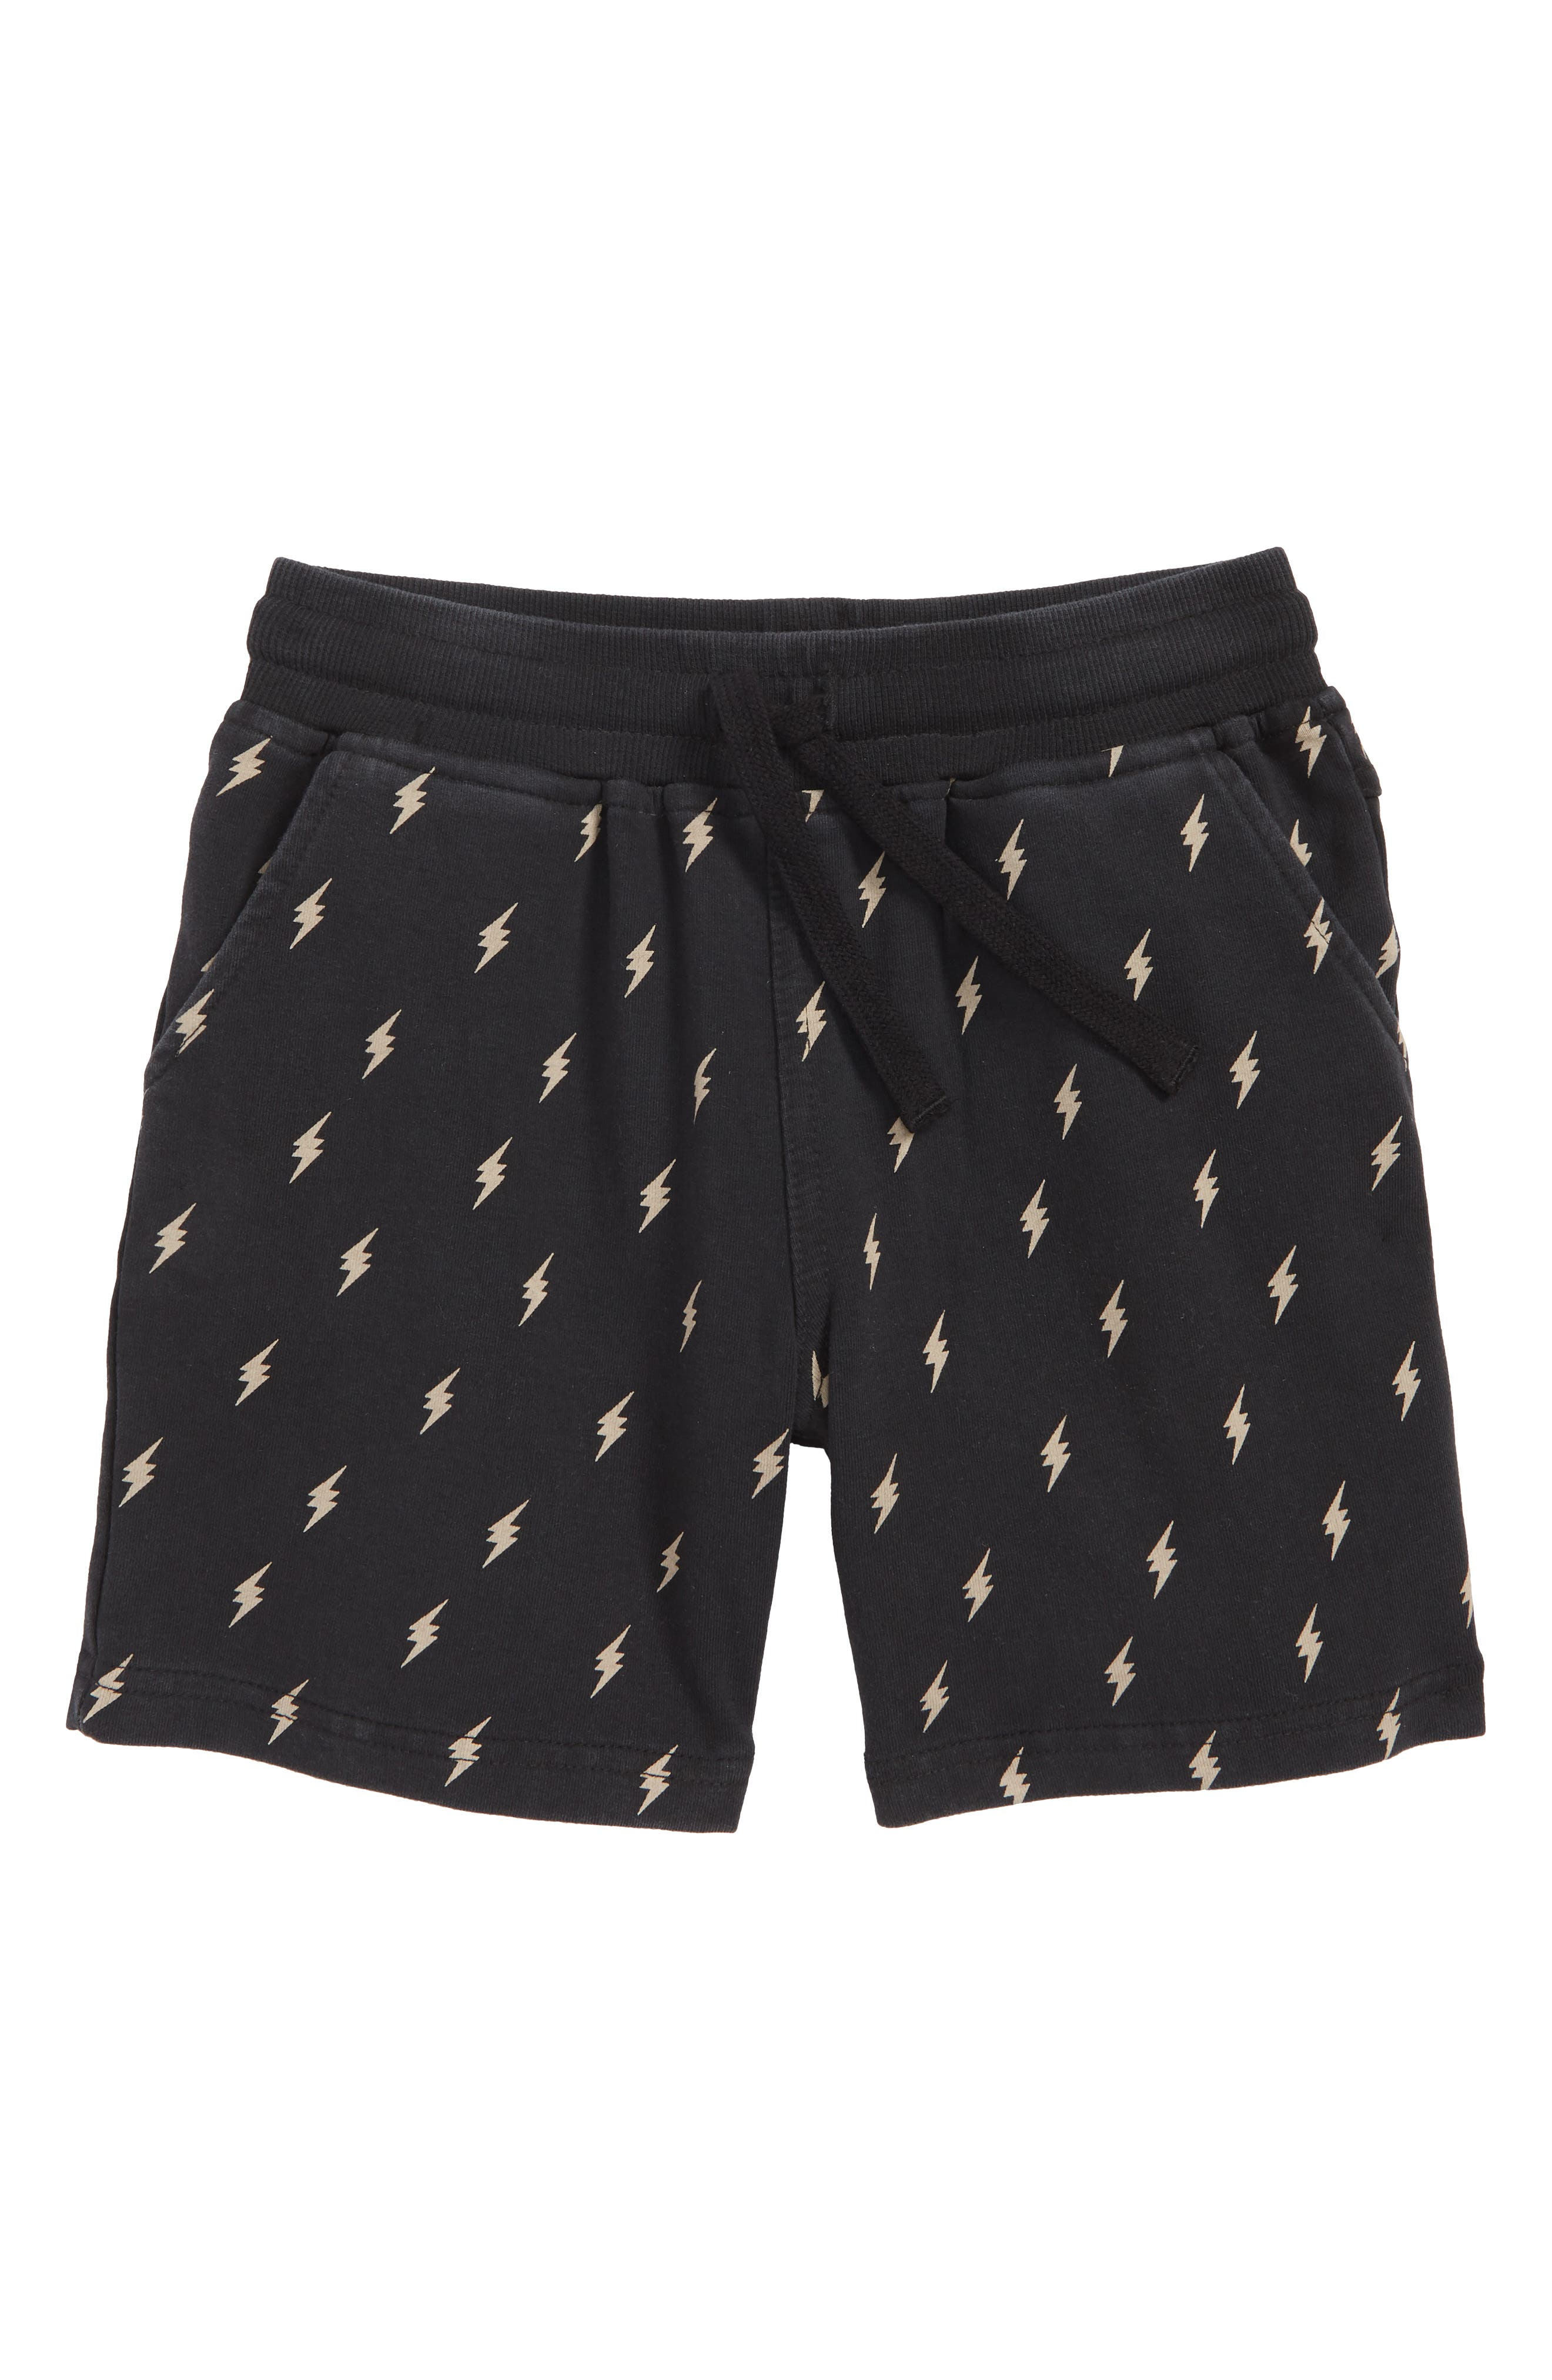 Thunderstruck Jogger Pants,                         Main,                         color, Black